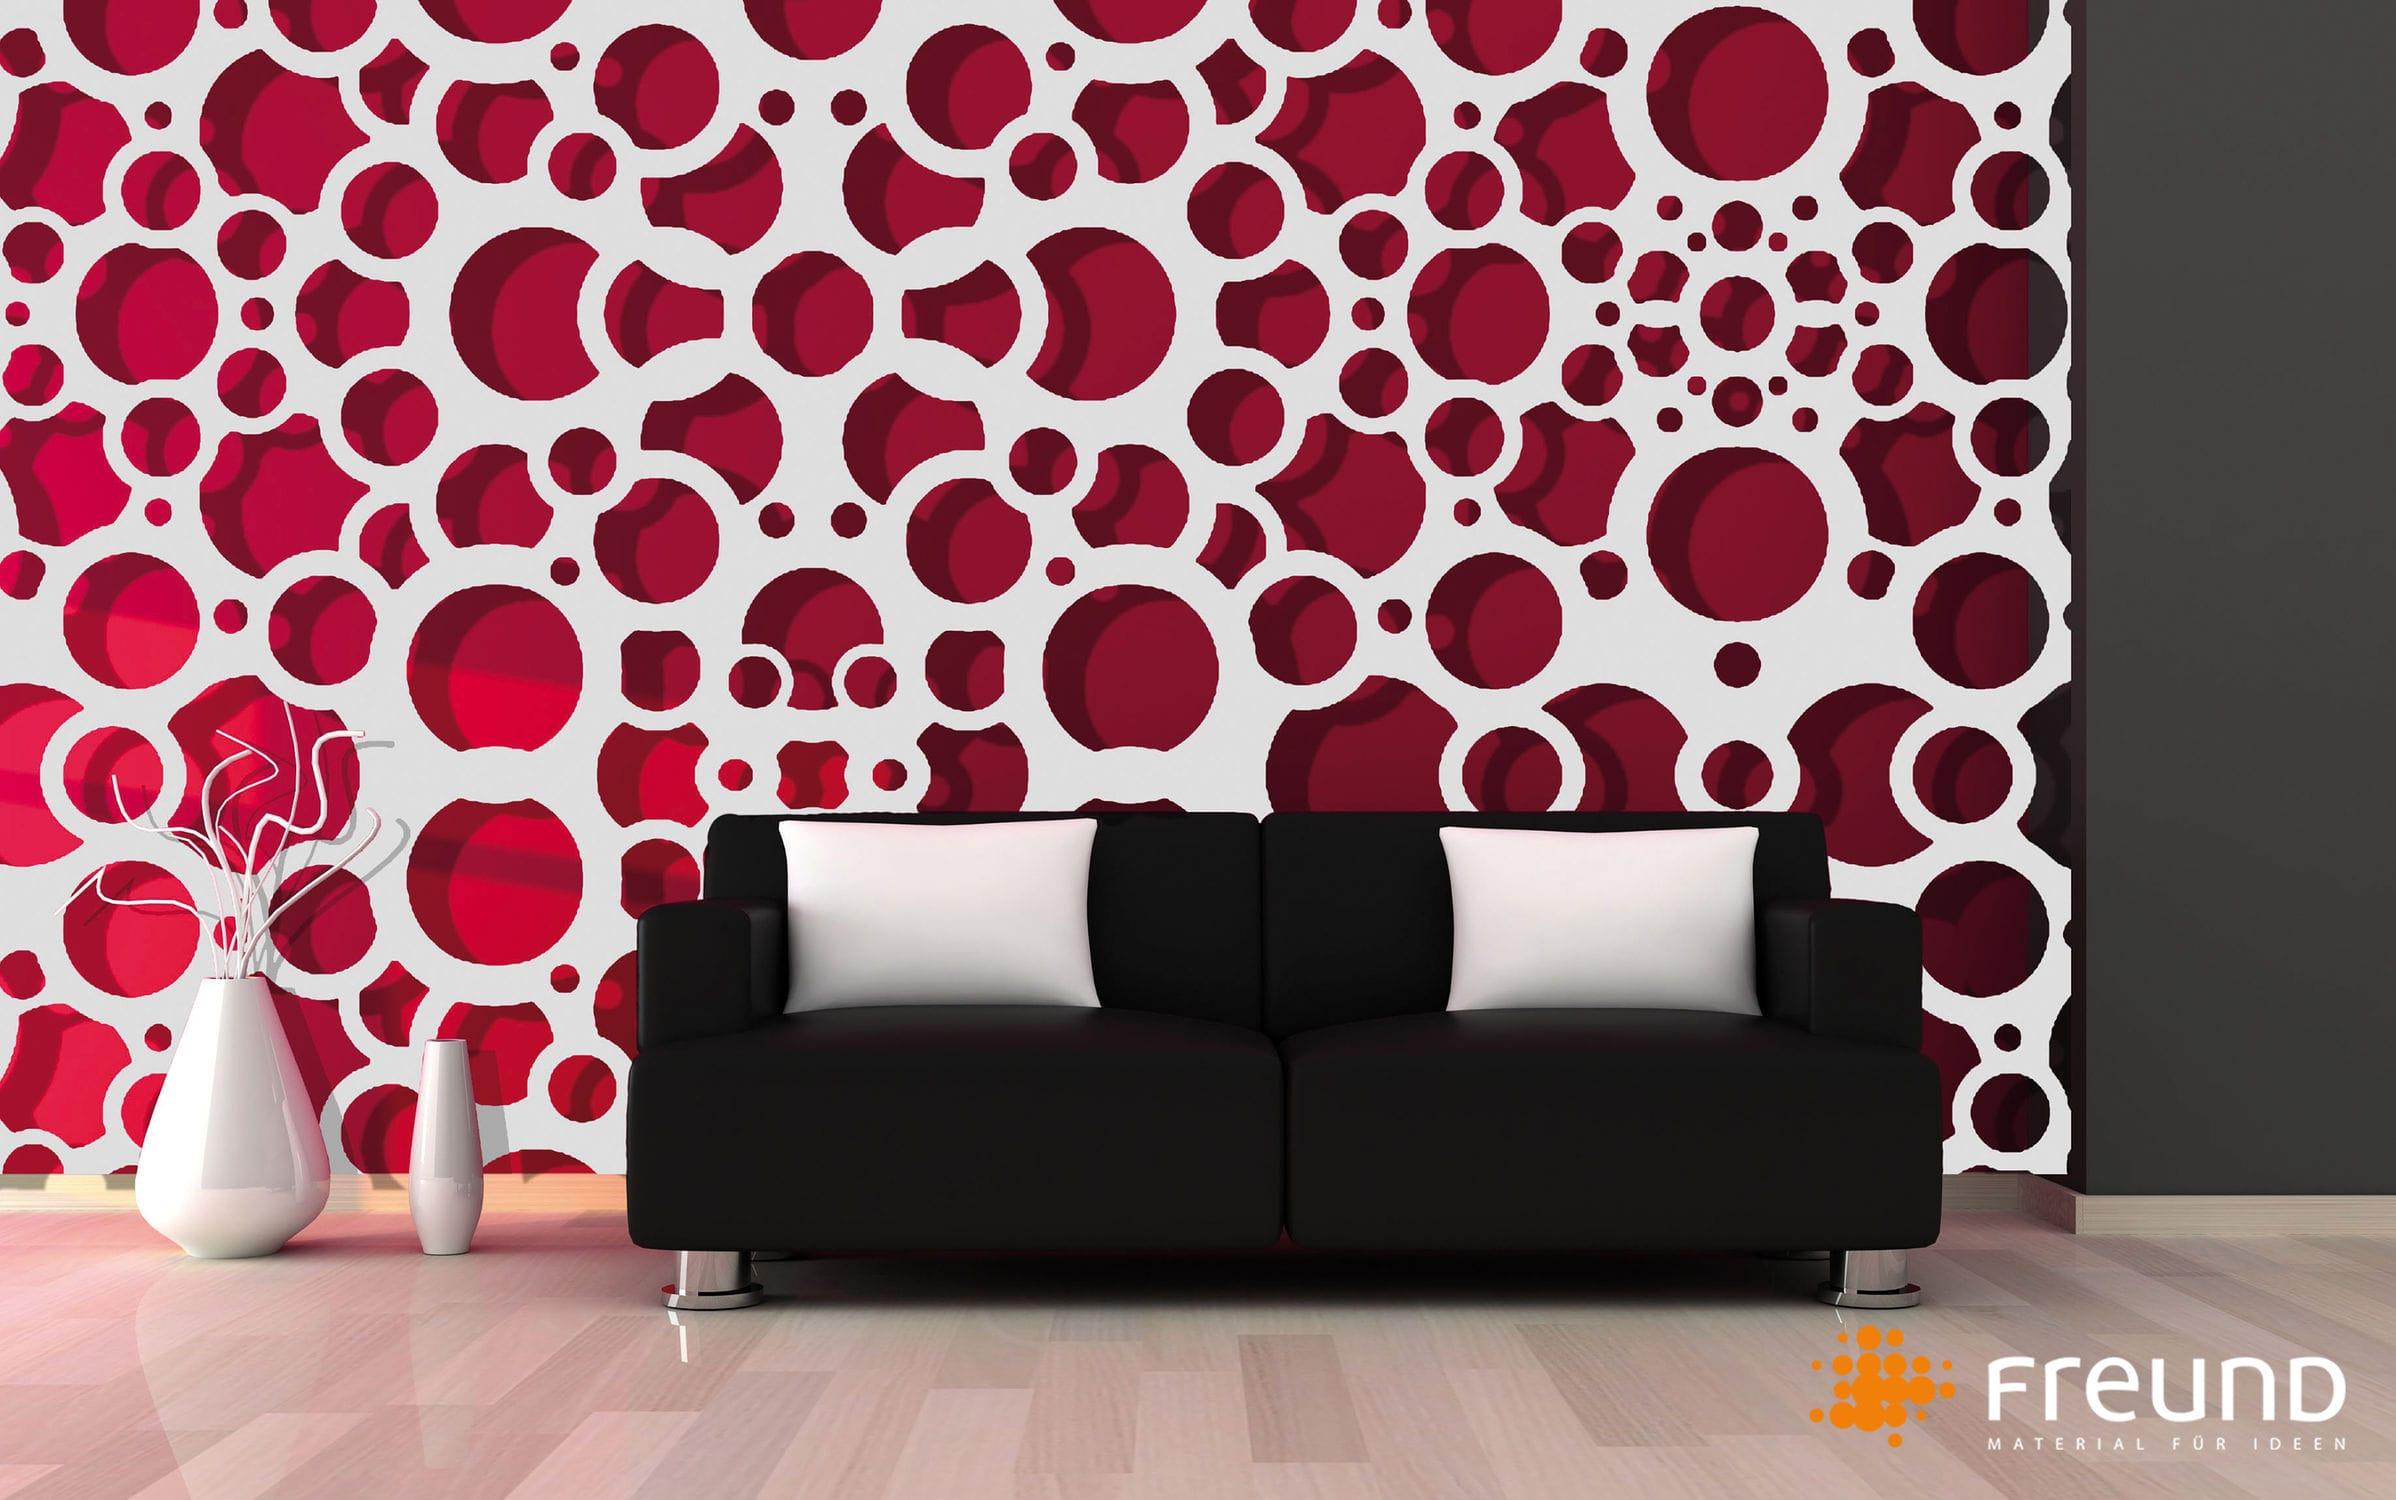 mdf decorative panel wall mounted 3d organic modular wall